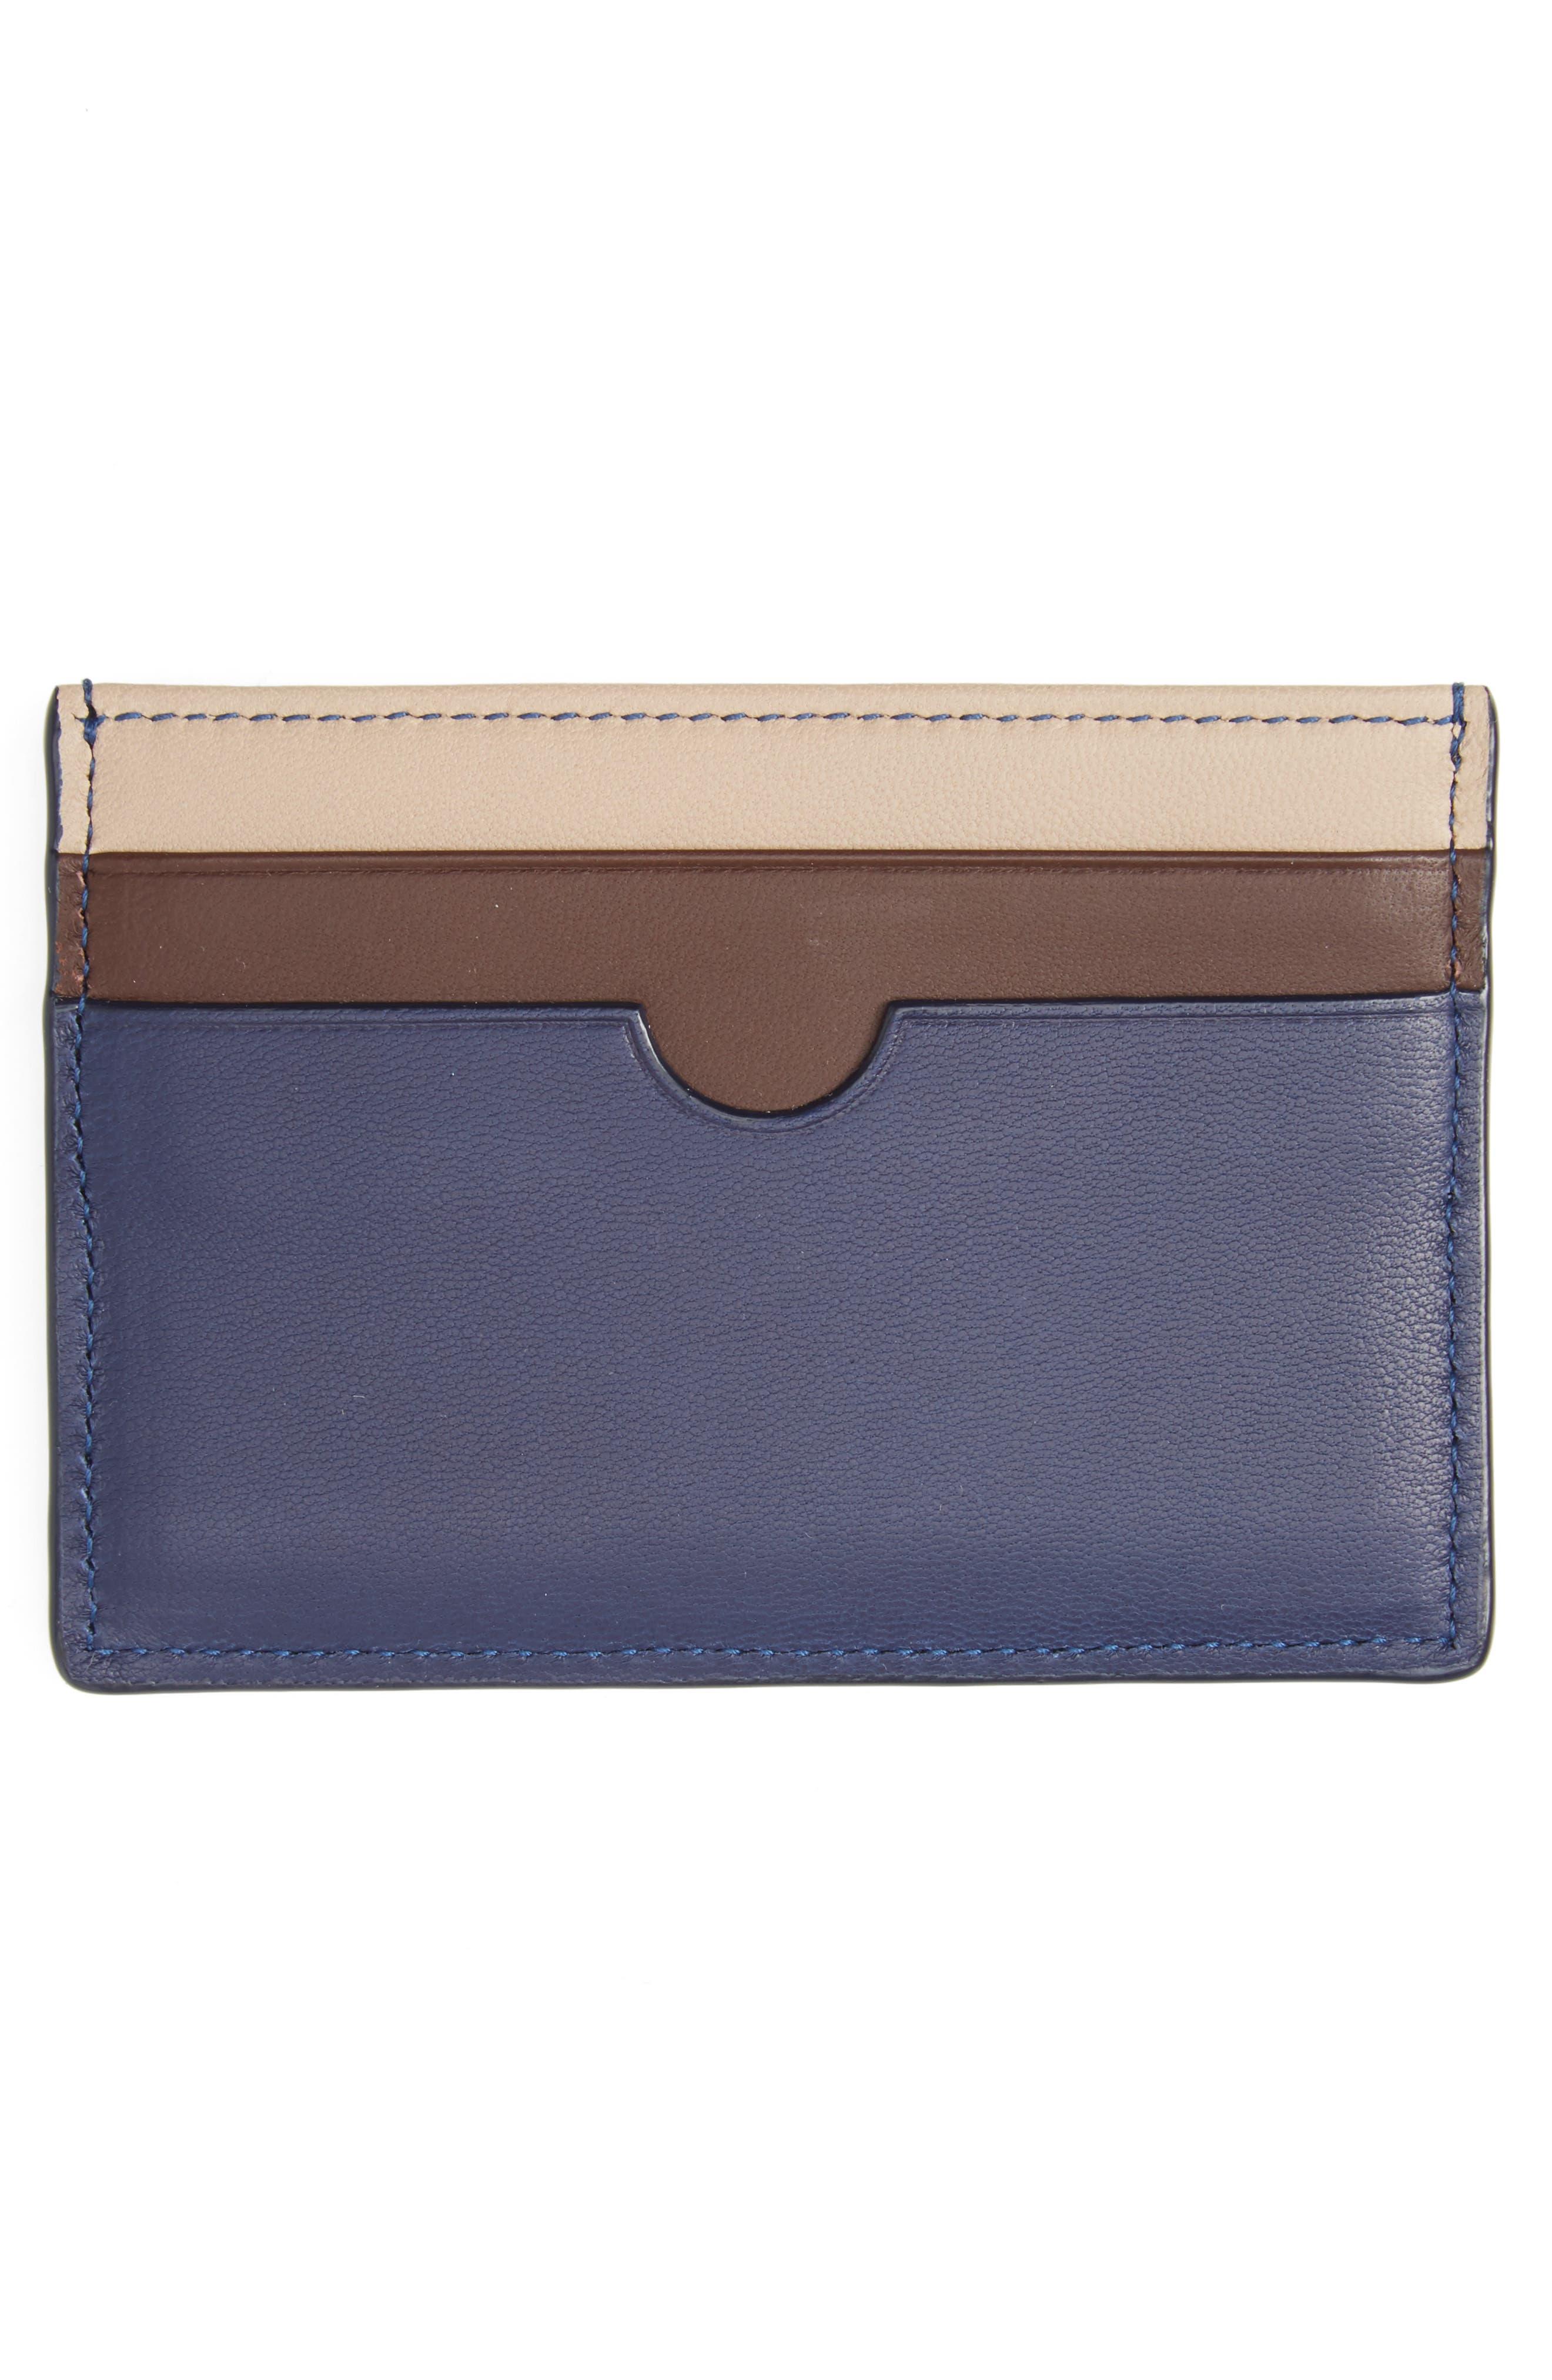 Tricolor Leather Card Case,                             Alternate thumbnail 2, color,                             Blue